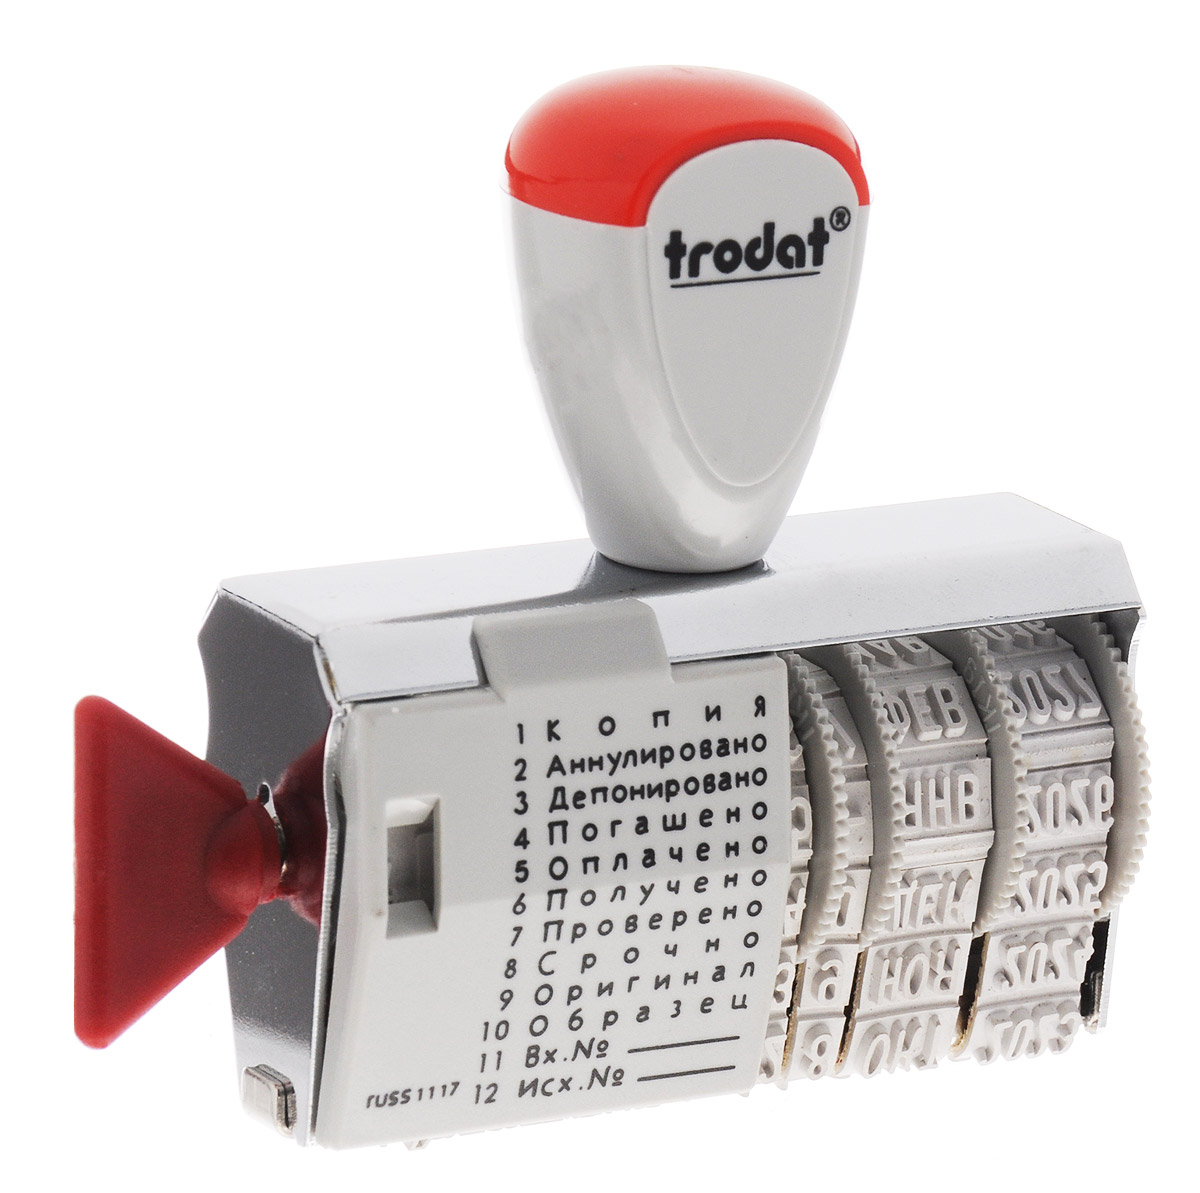 Trodat Датер ленточный 12 бухгалтерских терминов trodat мини датер printy месяц цифрами